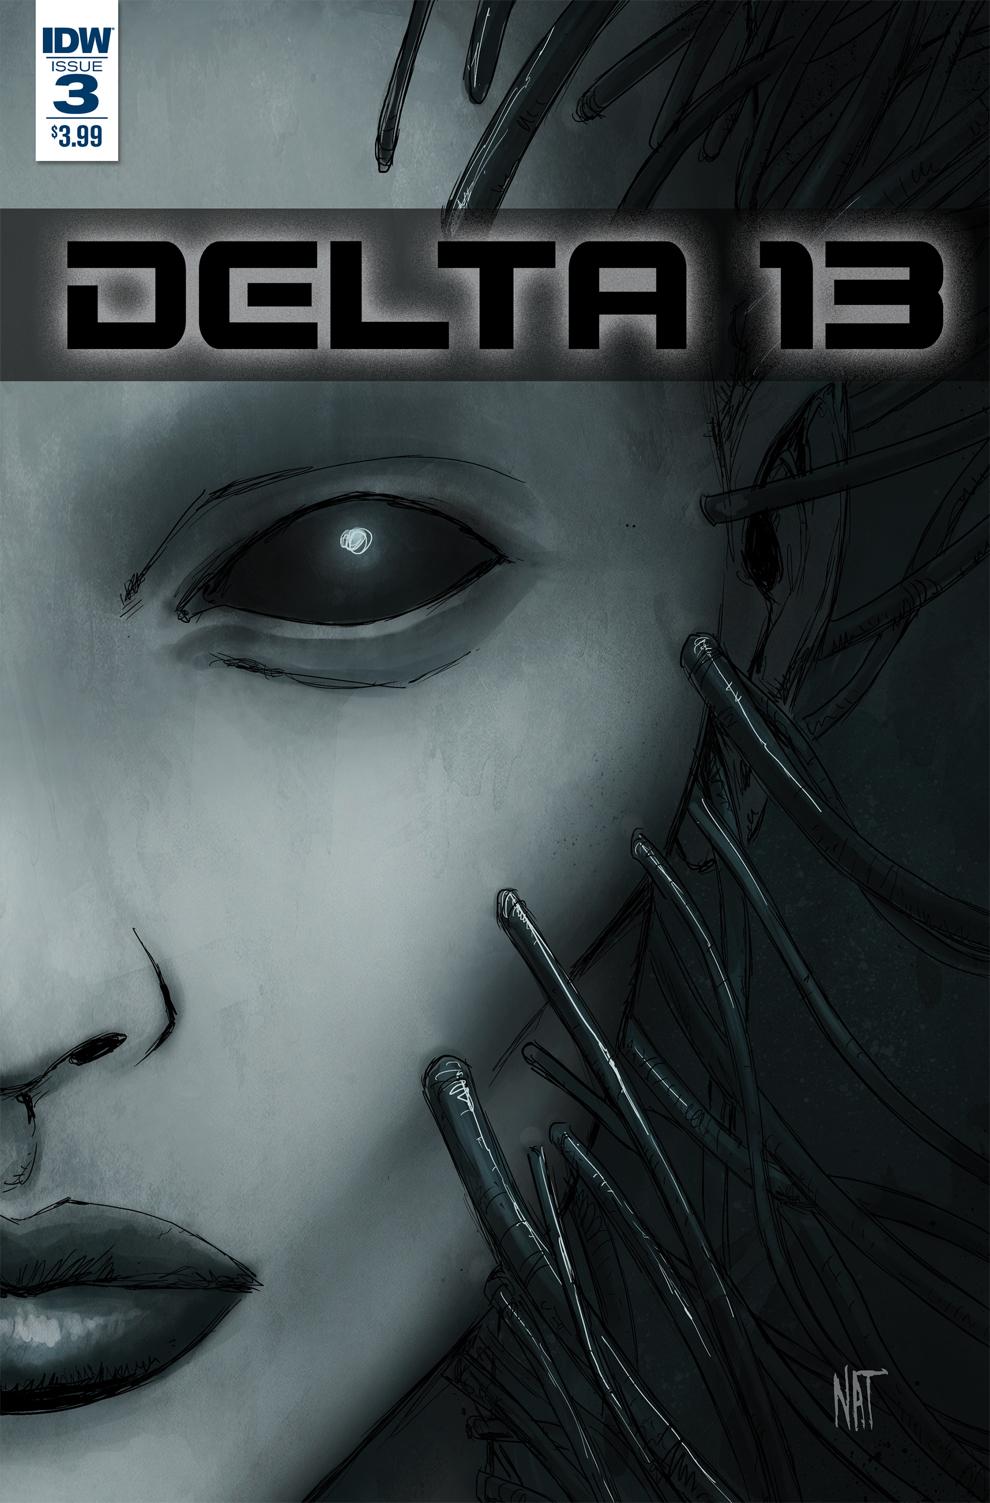 Delta 13 #3, IDW Publishing